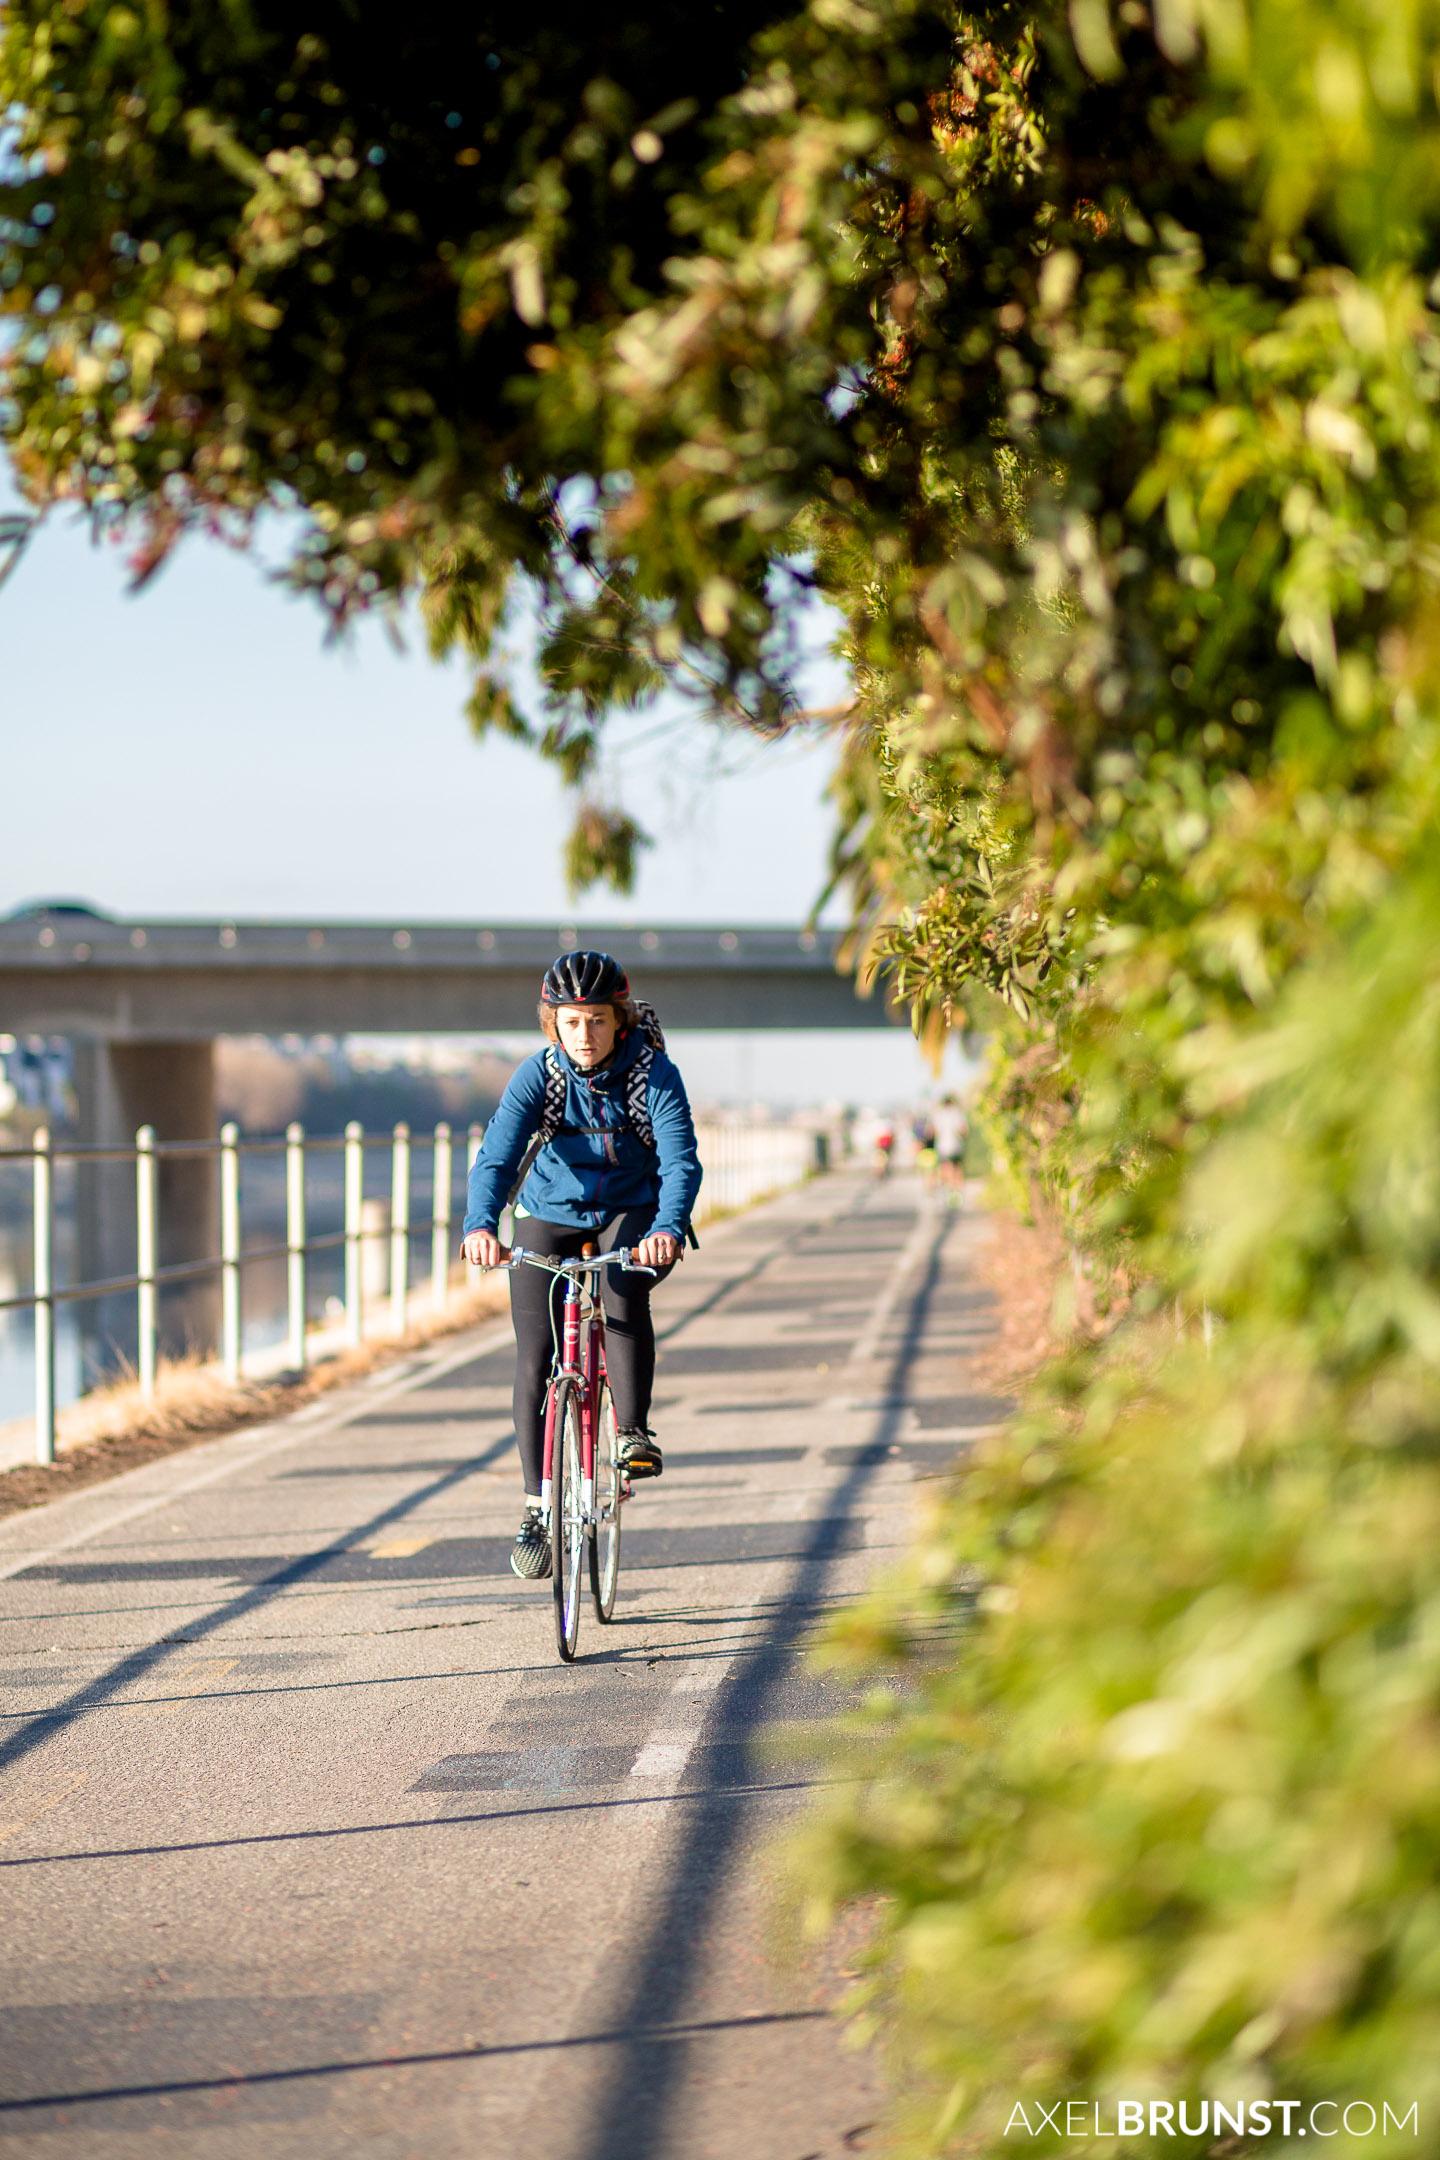 LA-LongBeach-Bike-ride-2.jpg